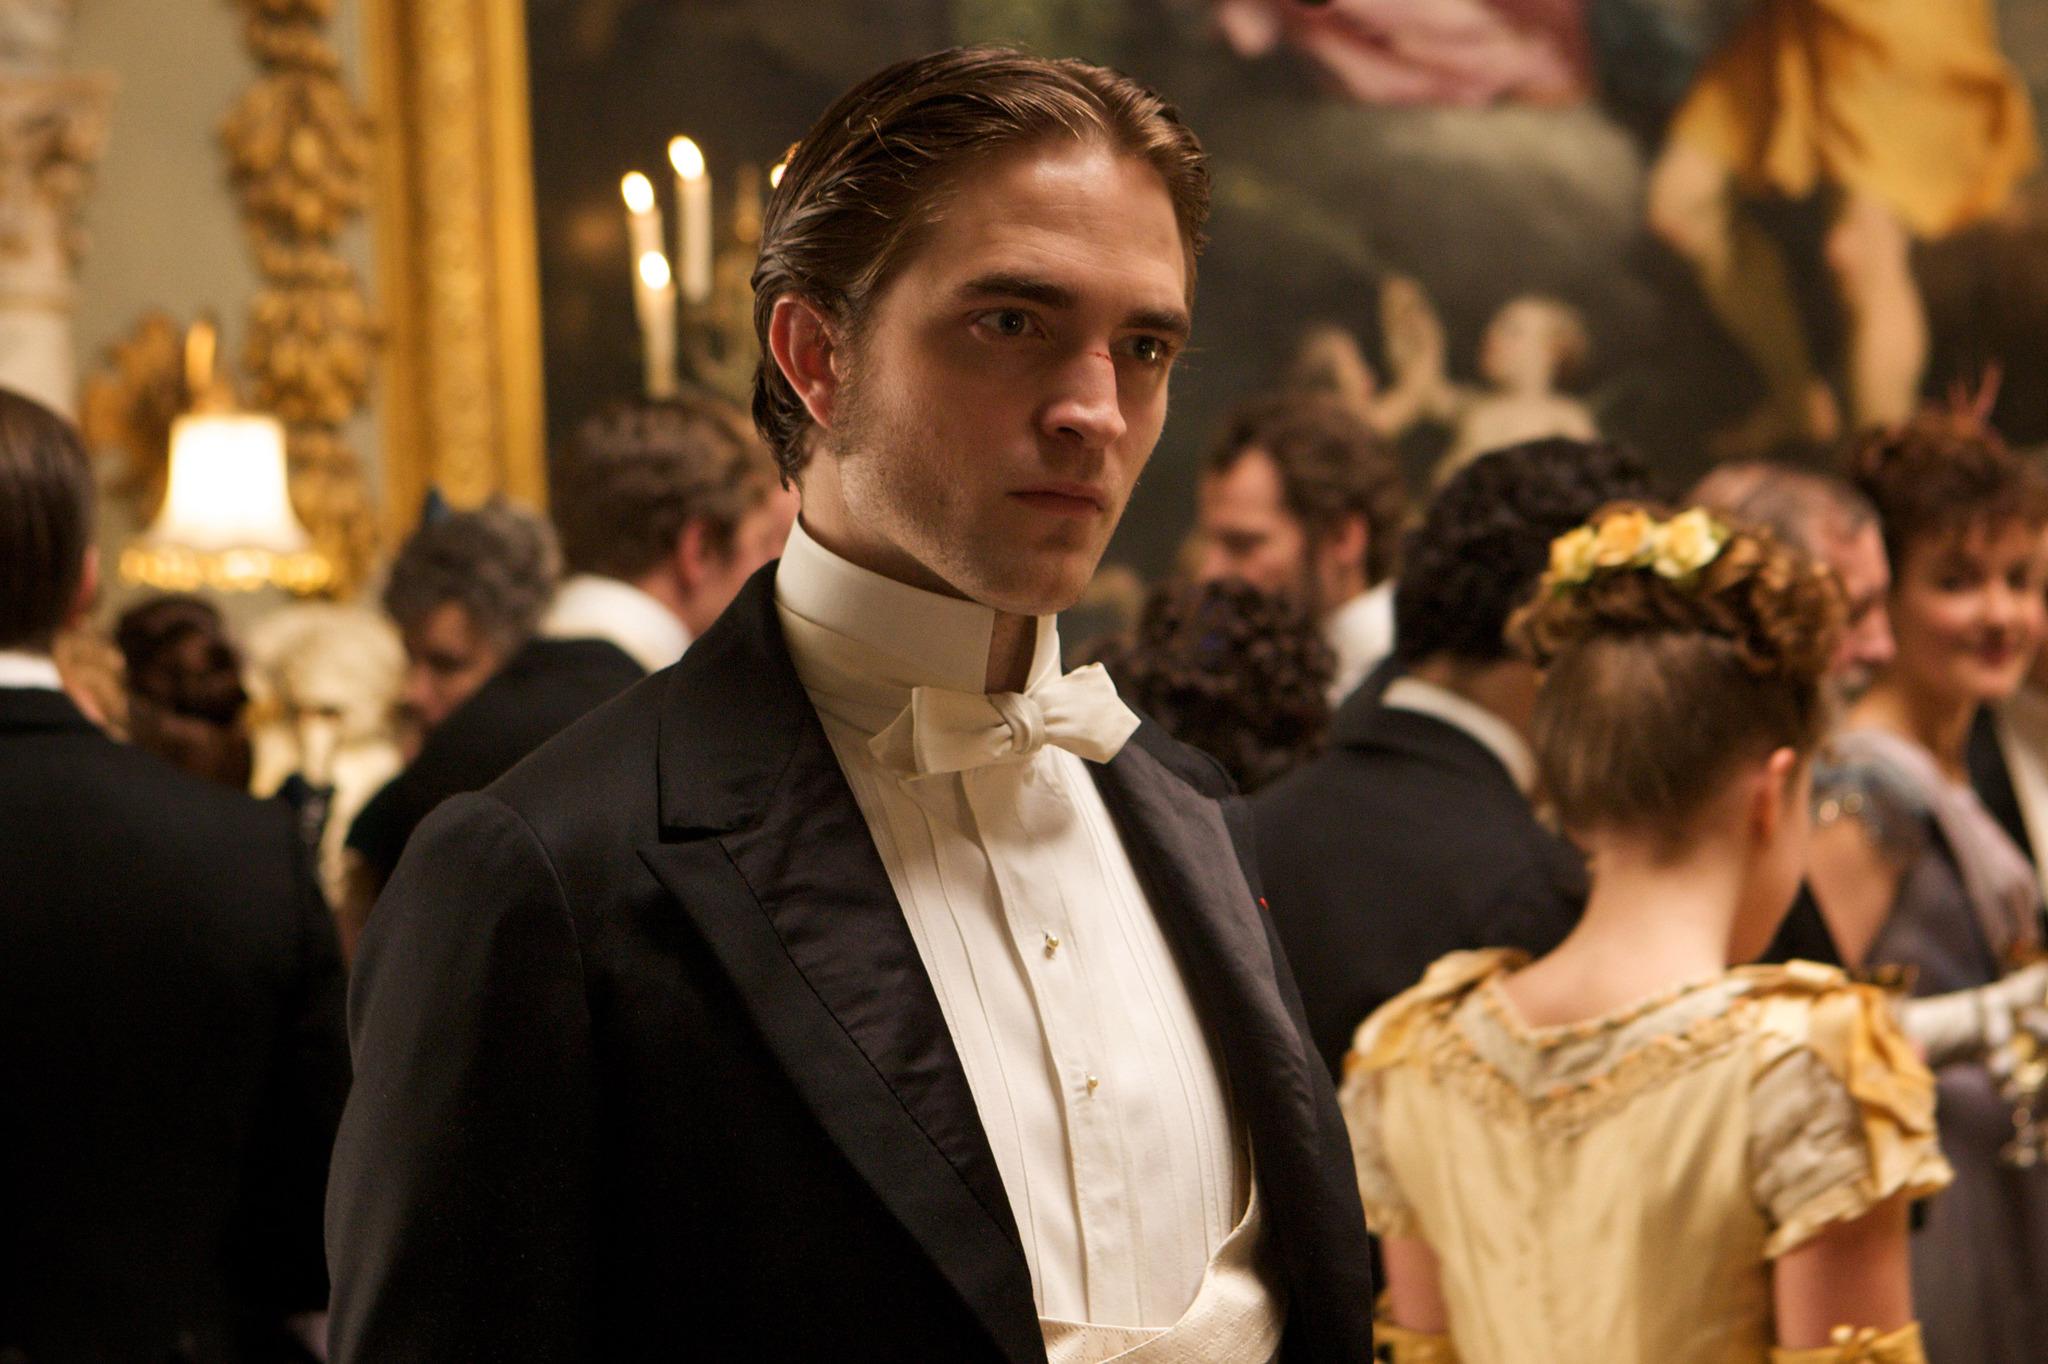 Robert Pattinson in Bel Ami (2012)